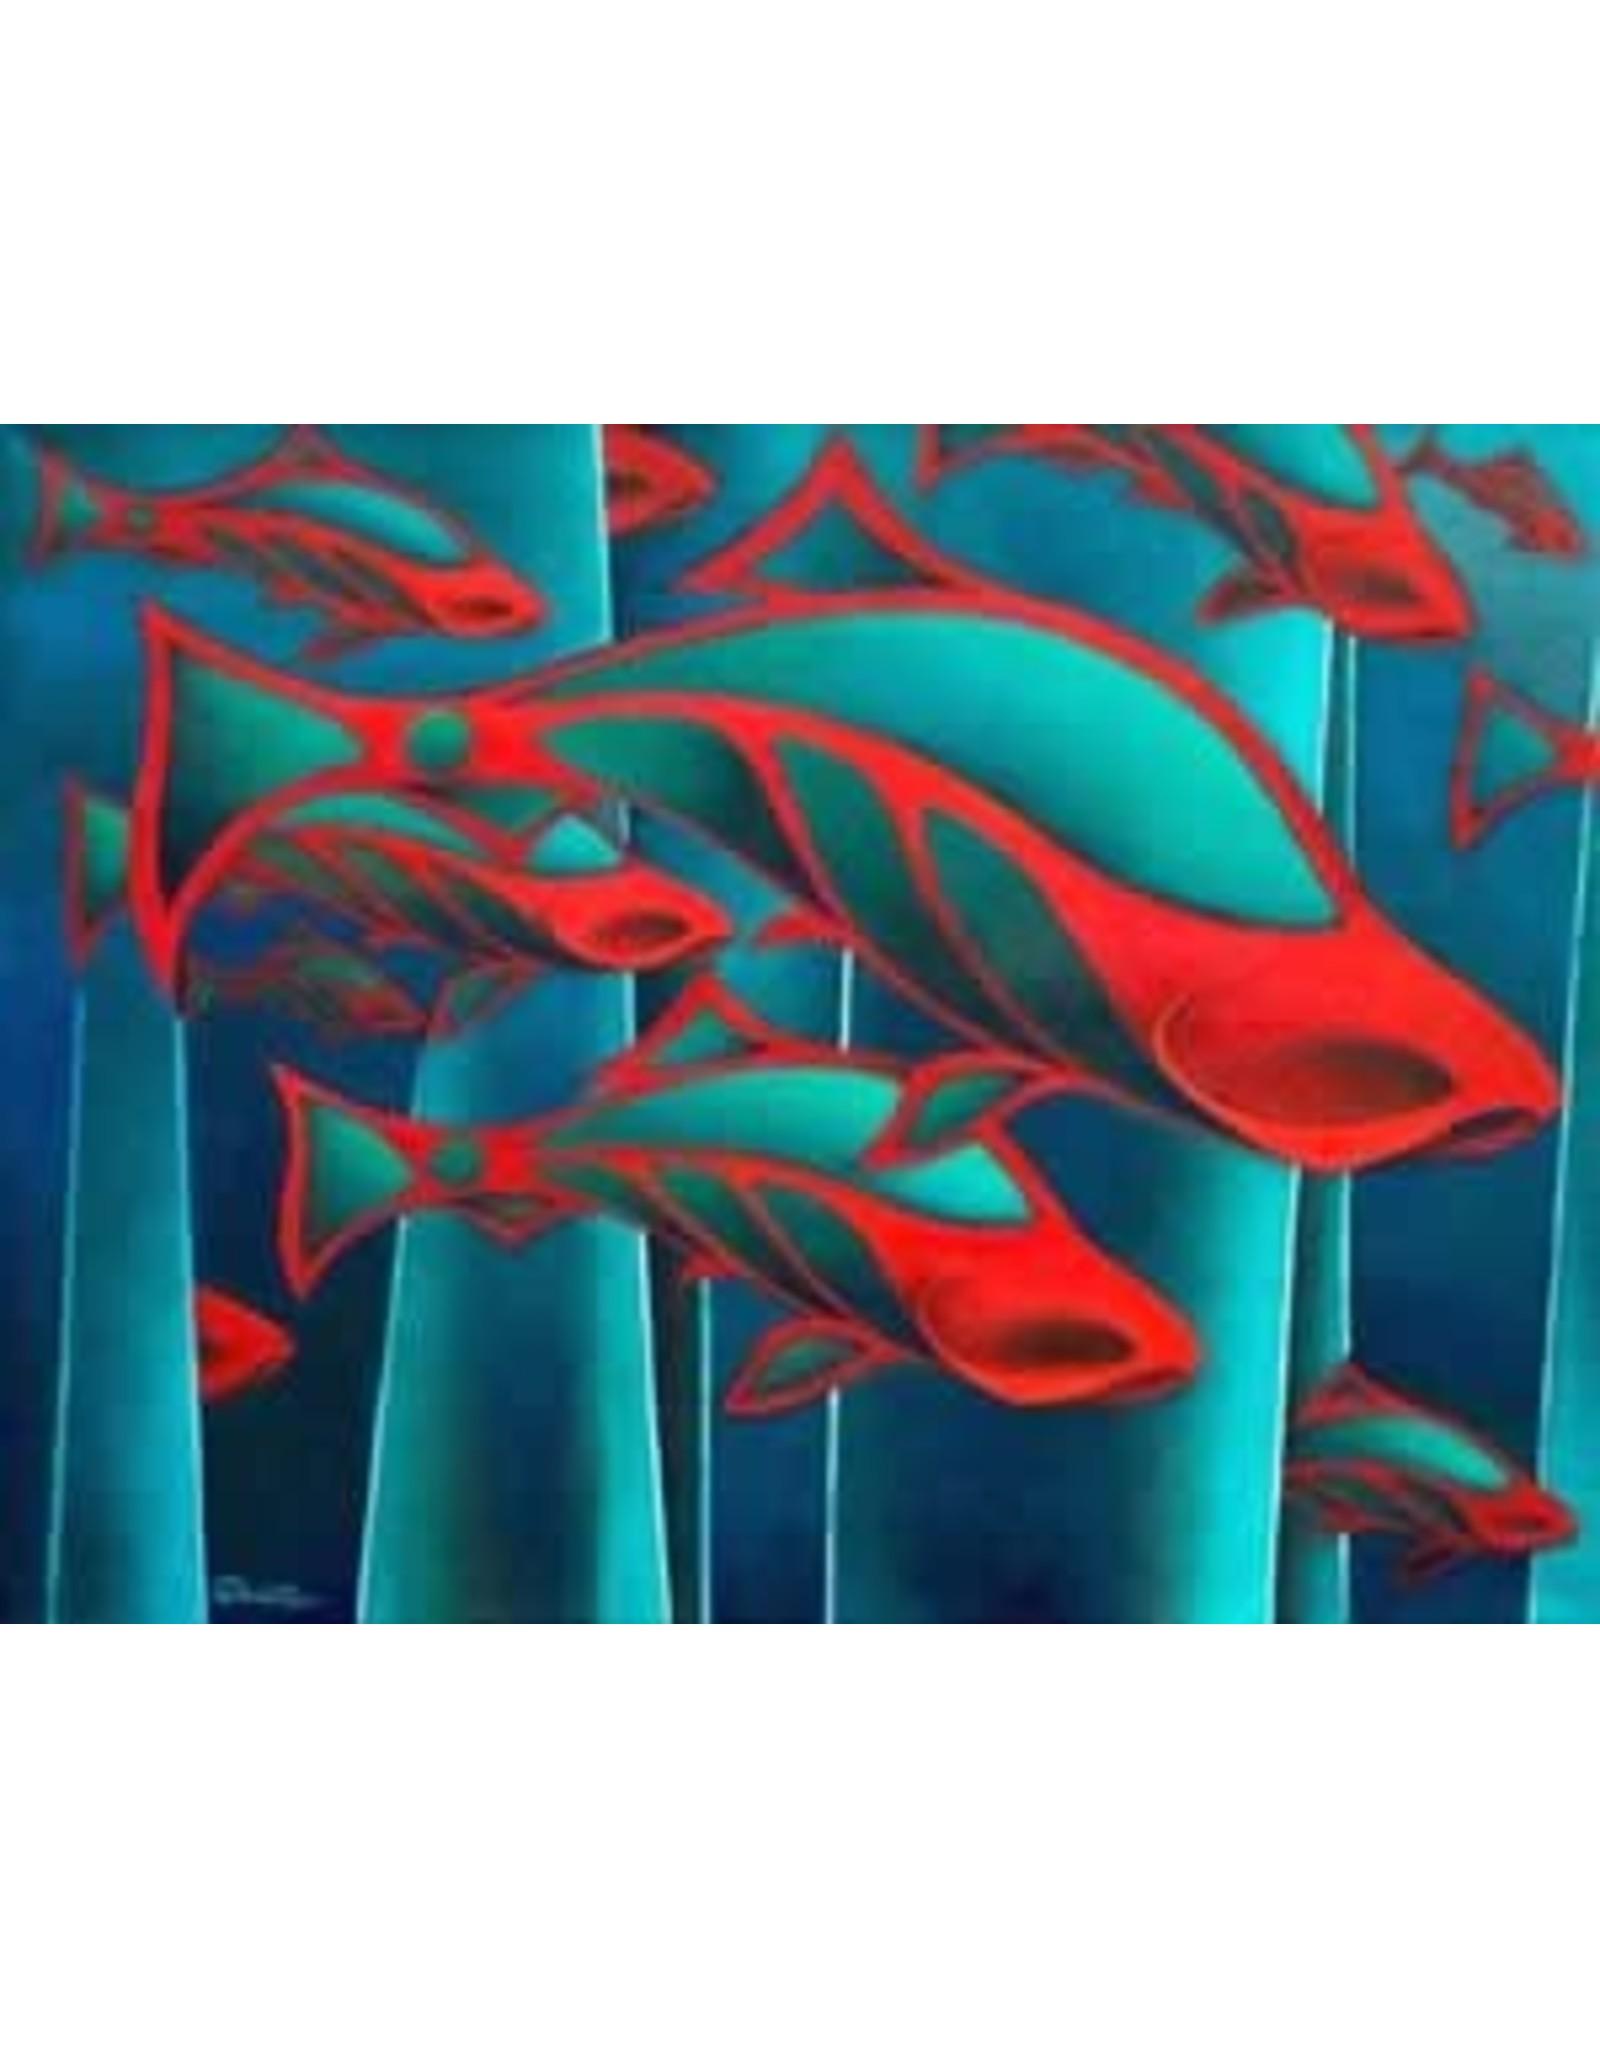 Nathalie Parenteau Salmon School | Nathalie Parenteau